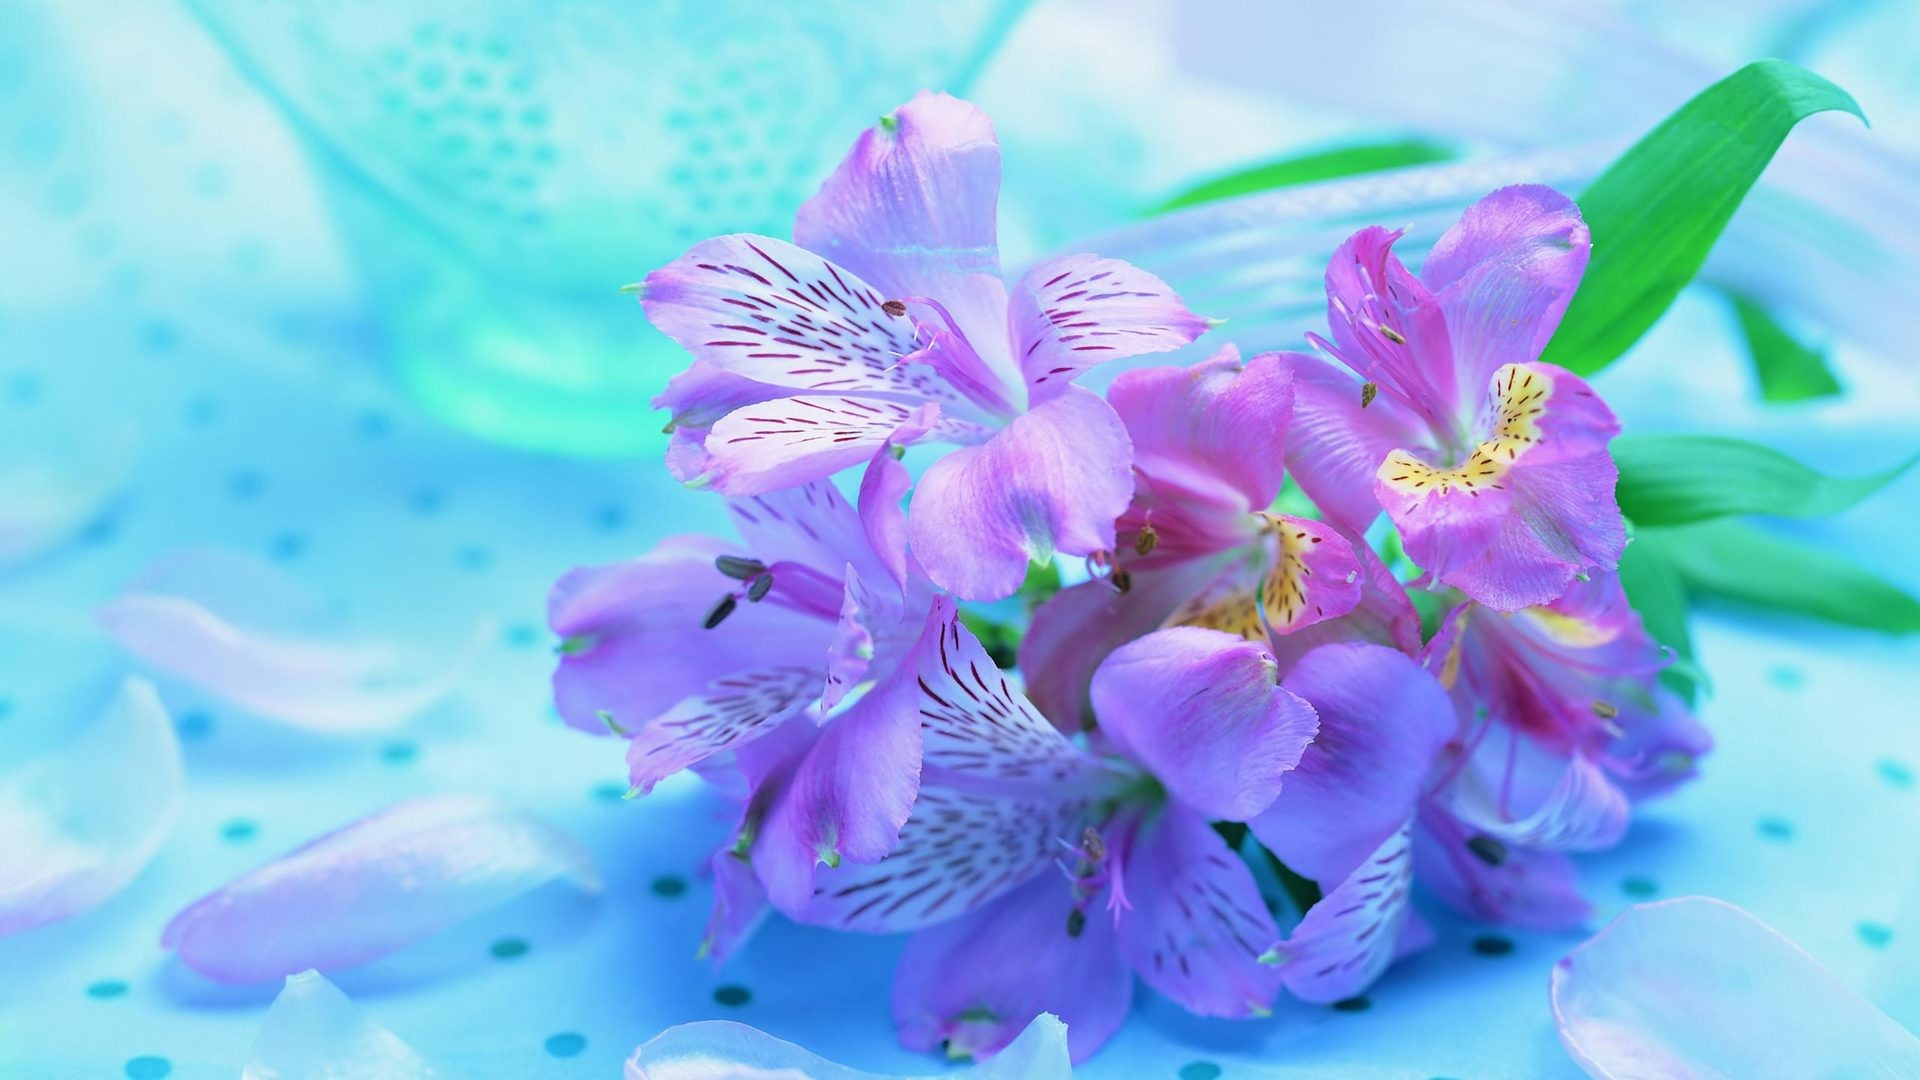 Beautiful flower wallpaper for desktop wallpaper